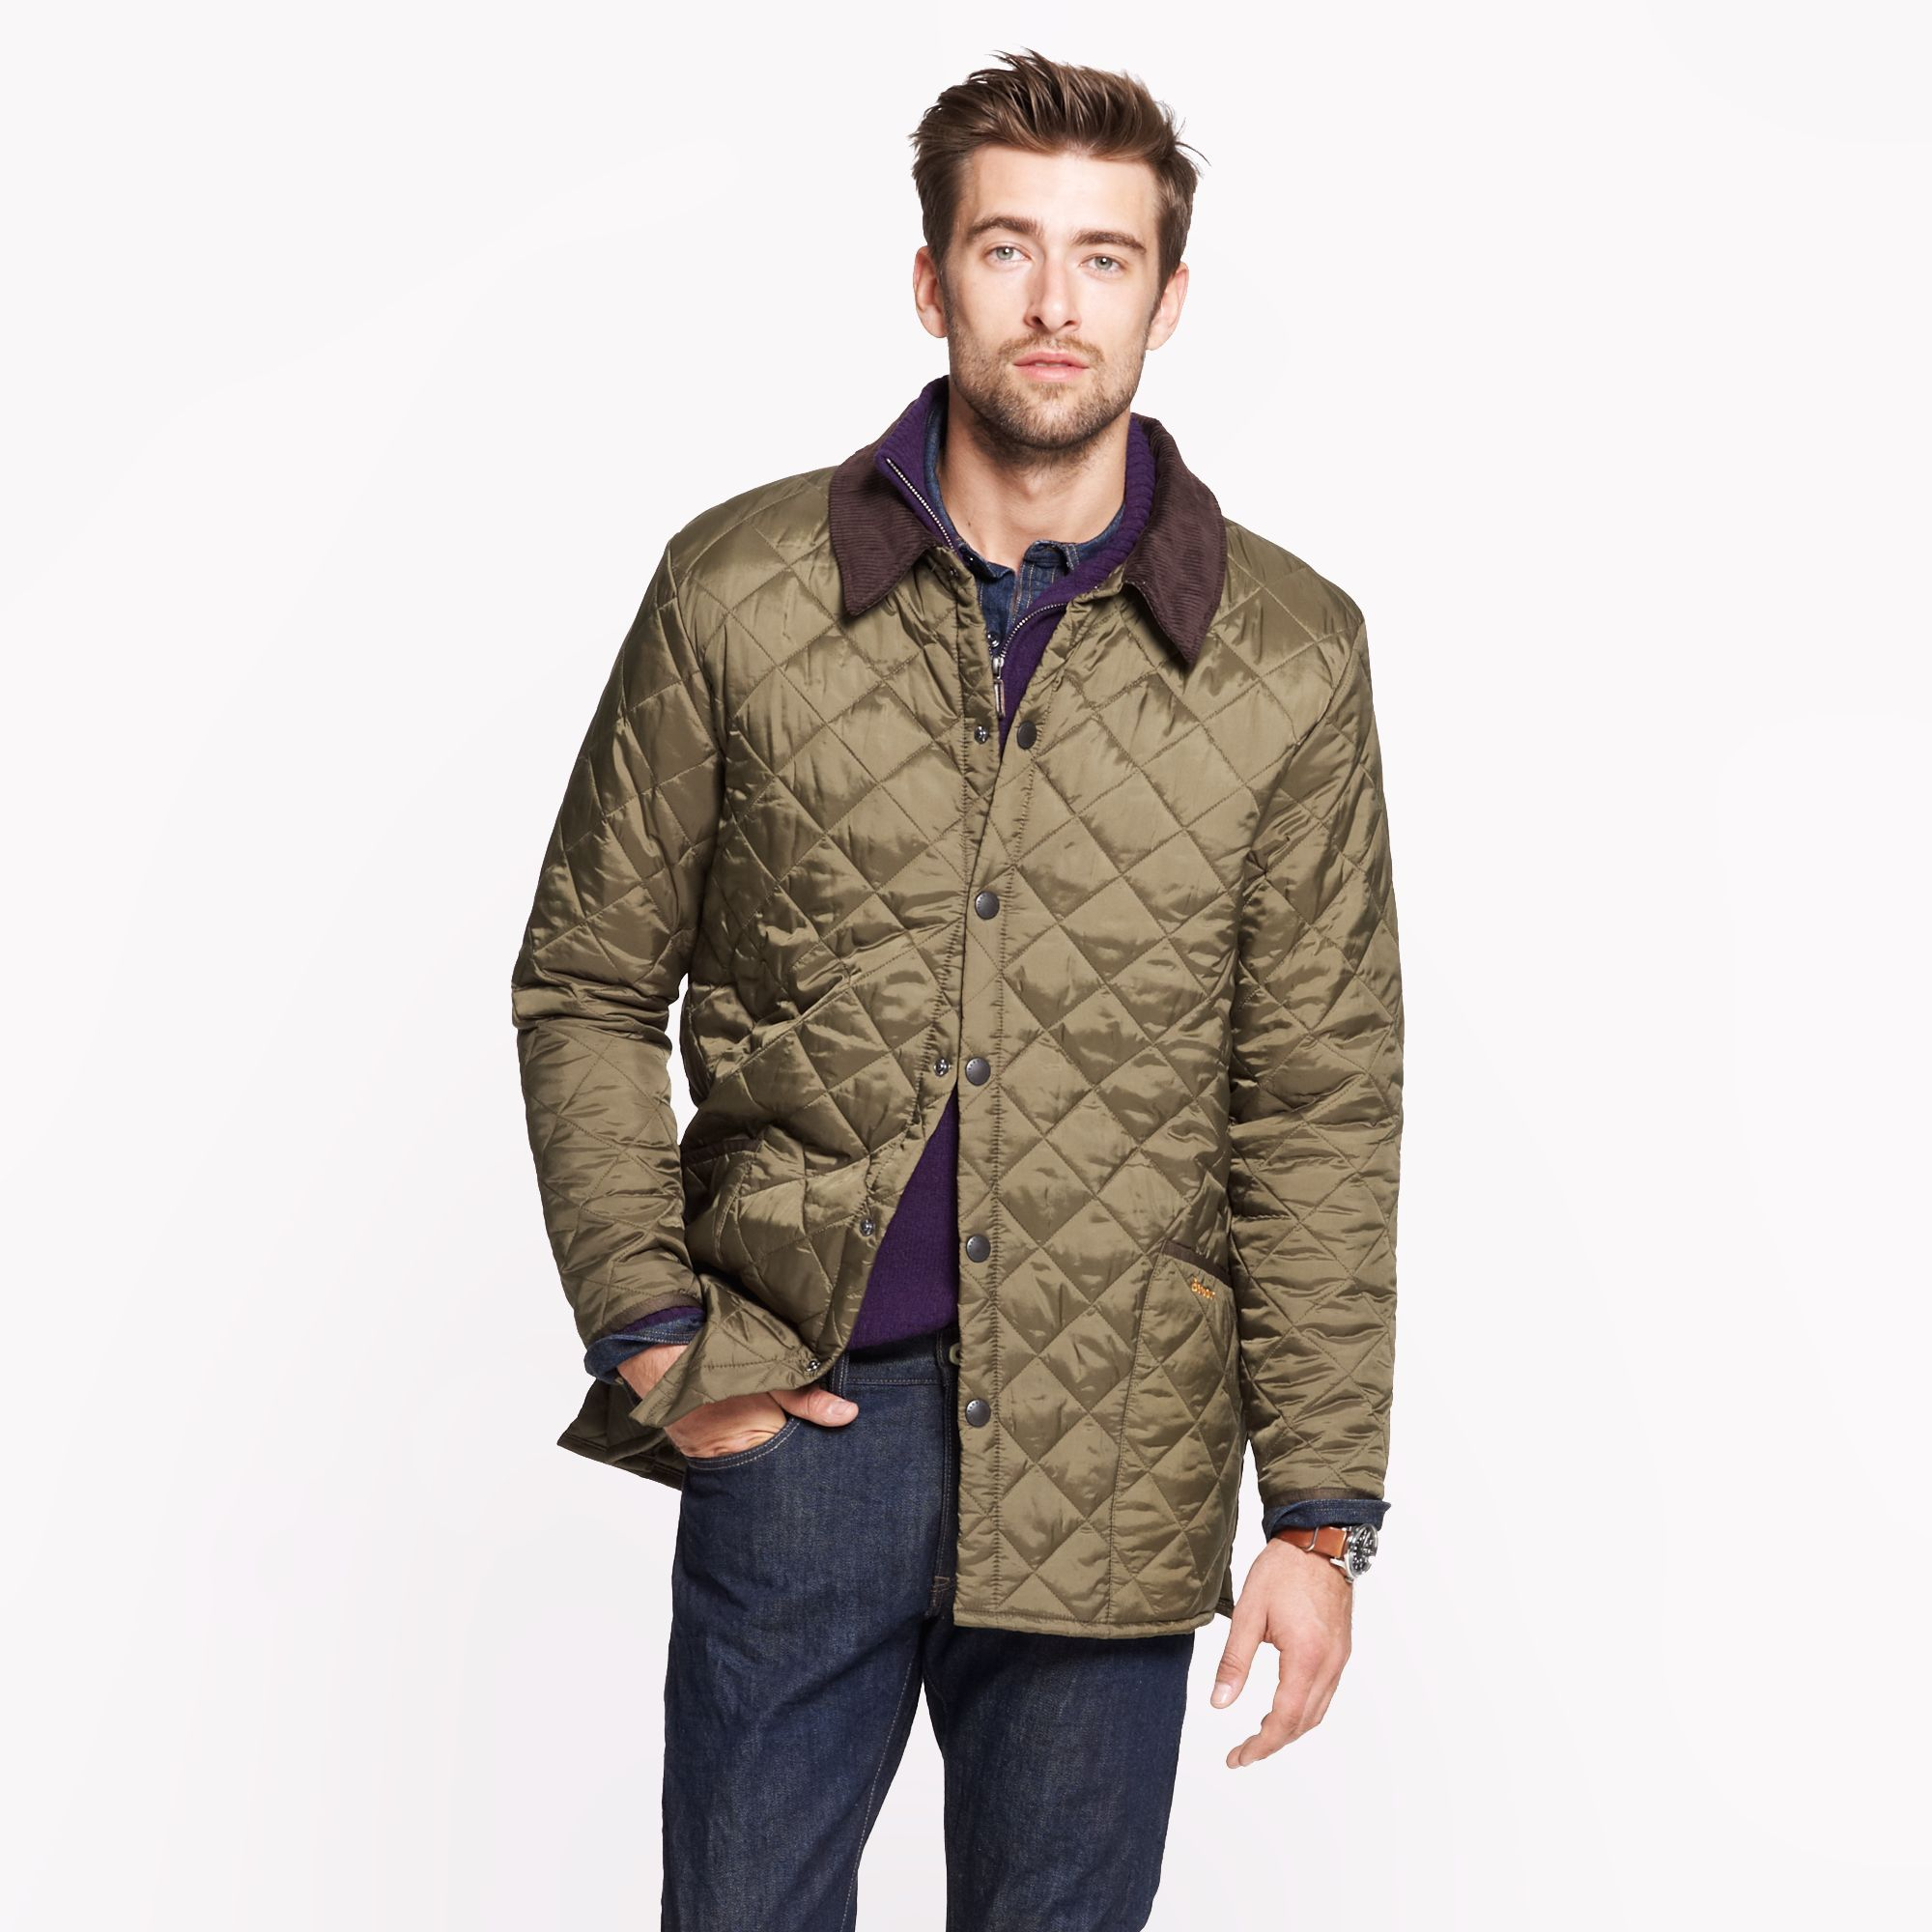 J Crew Barbour Liddesdale Jacket In Green For Men Lyst